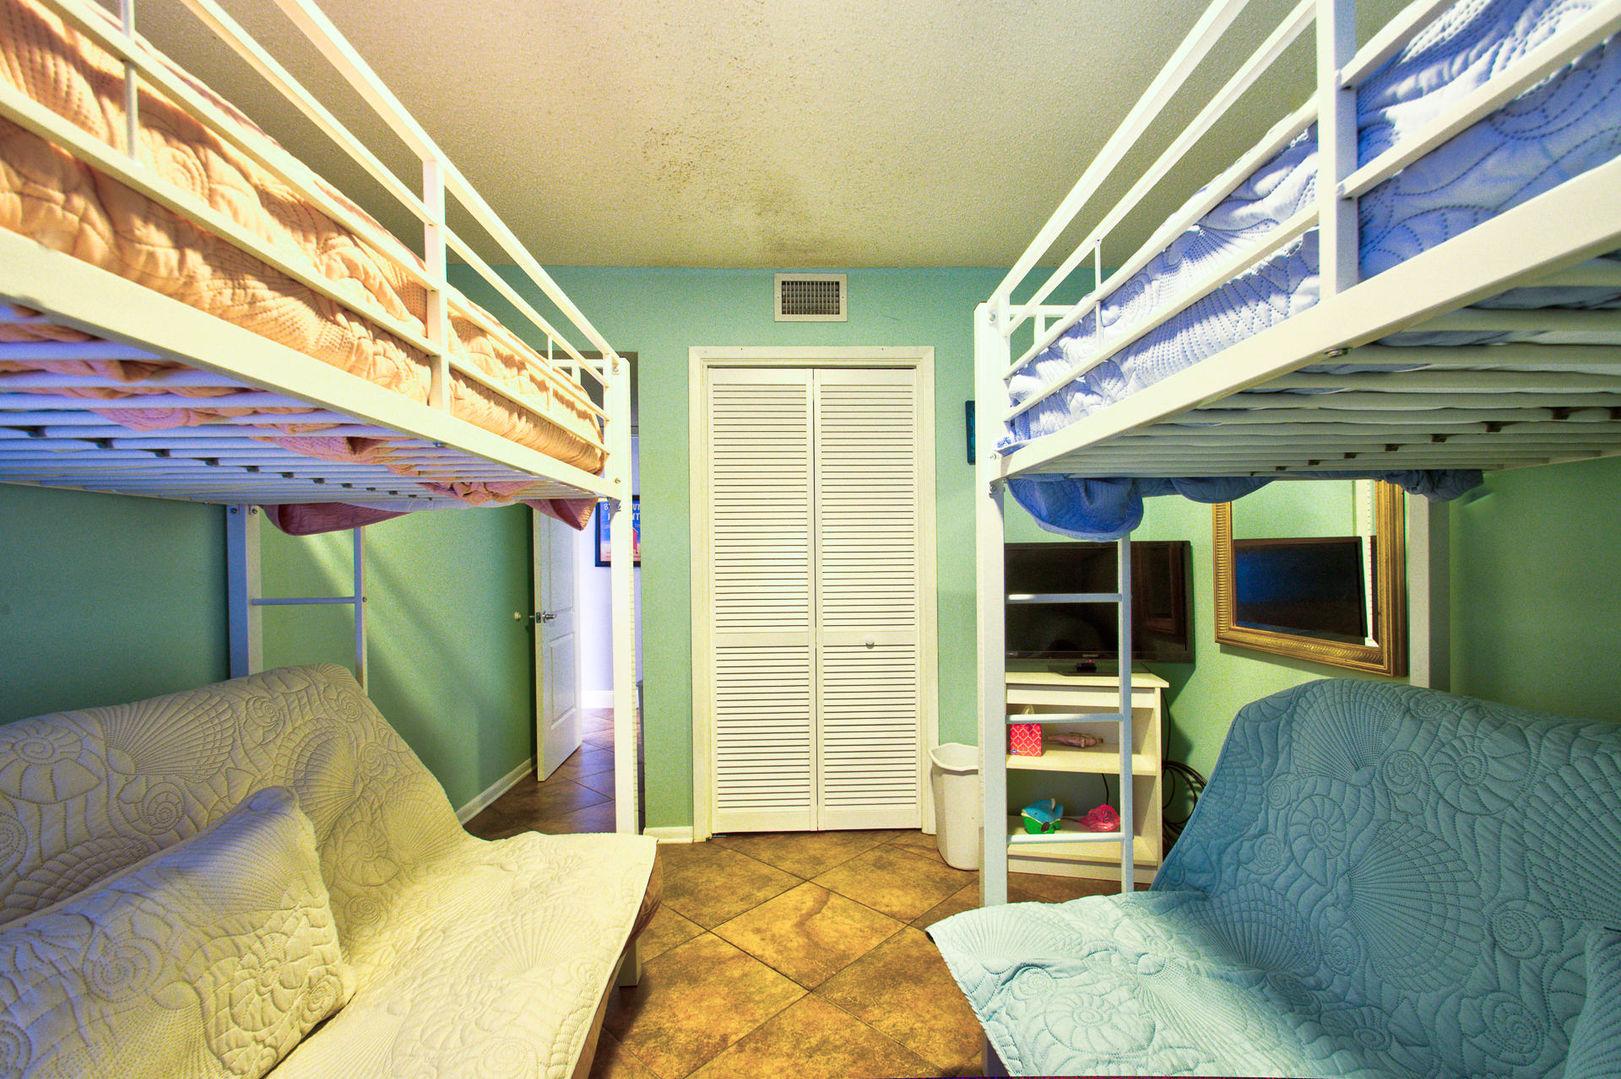 Bedroom #2 Is Great for Kids